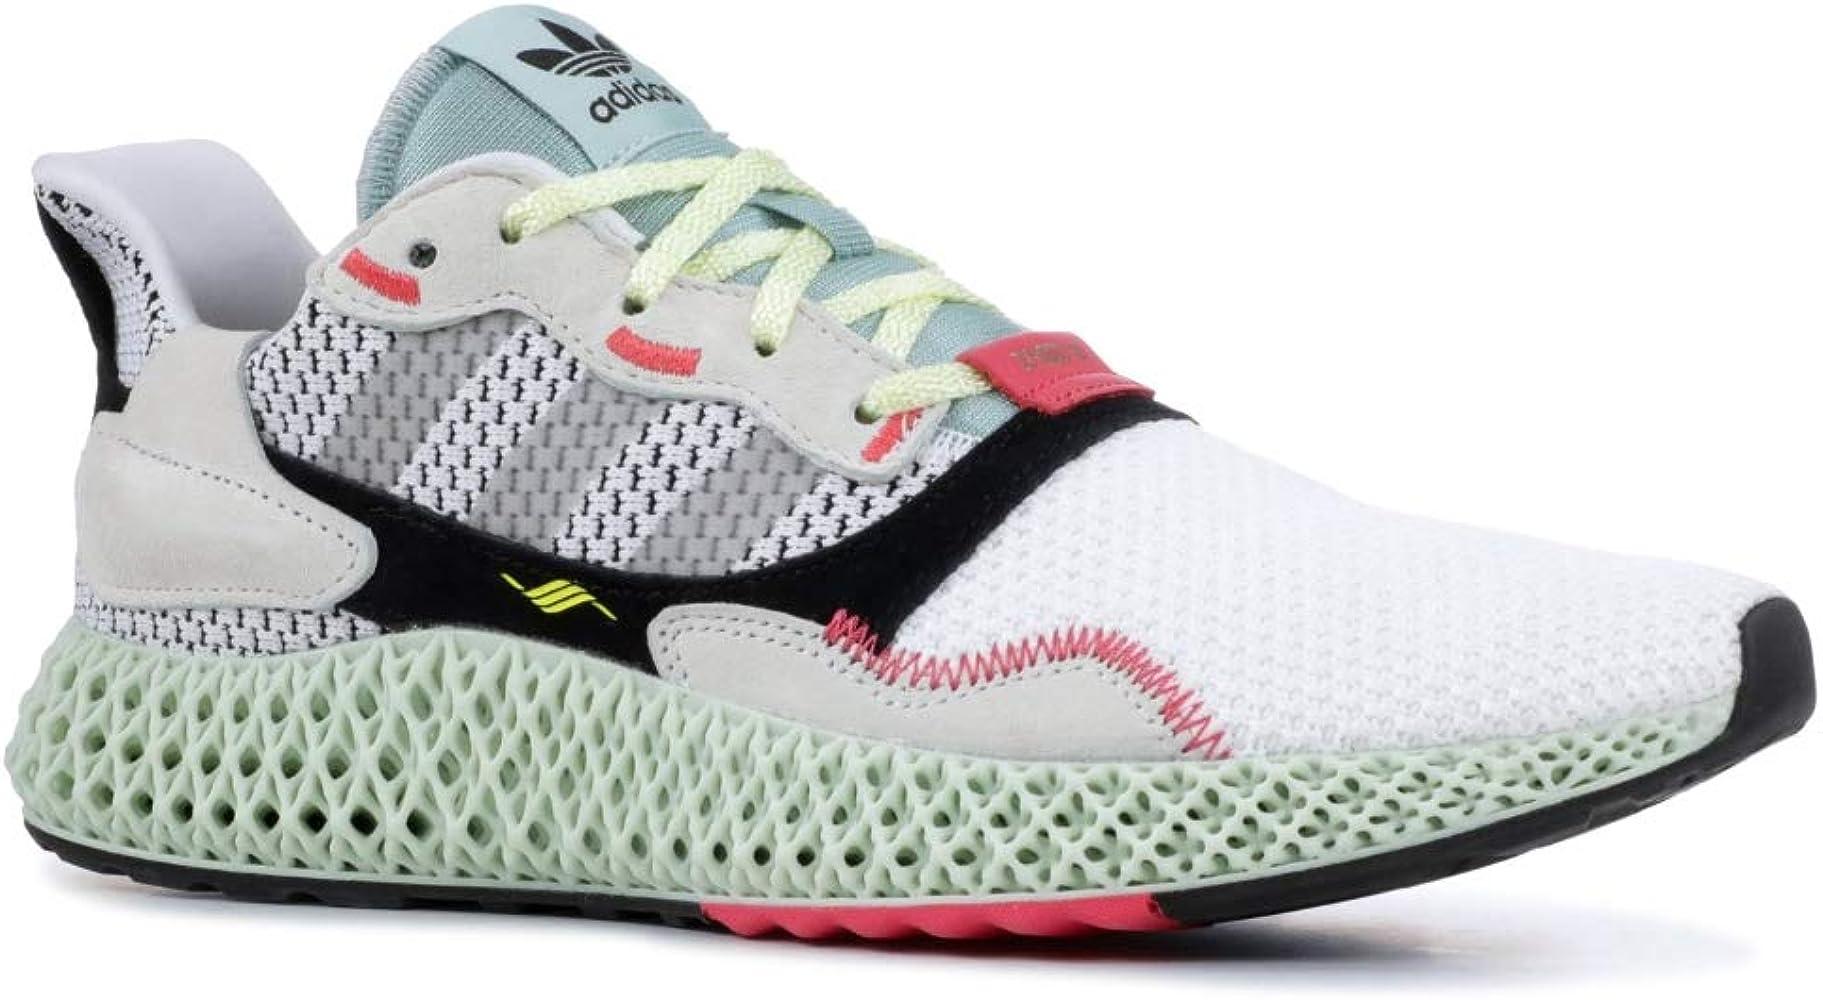 innovative design ba754 f6c19 Amazon.com | adidas Zx 4000 4D - B42203 - Size 12 | Shoes